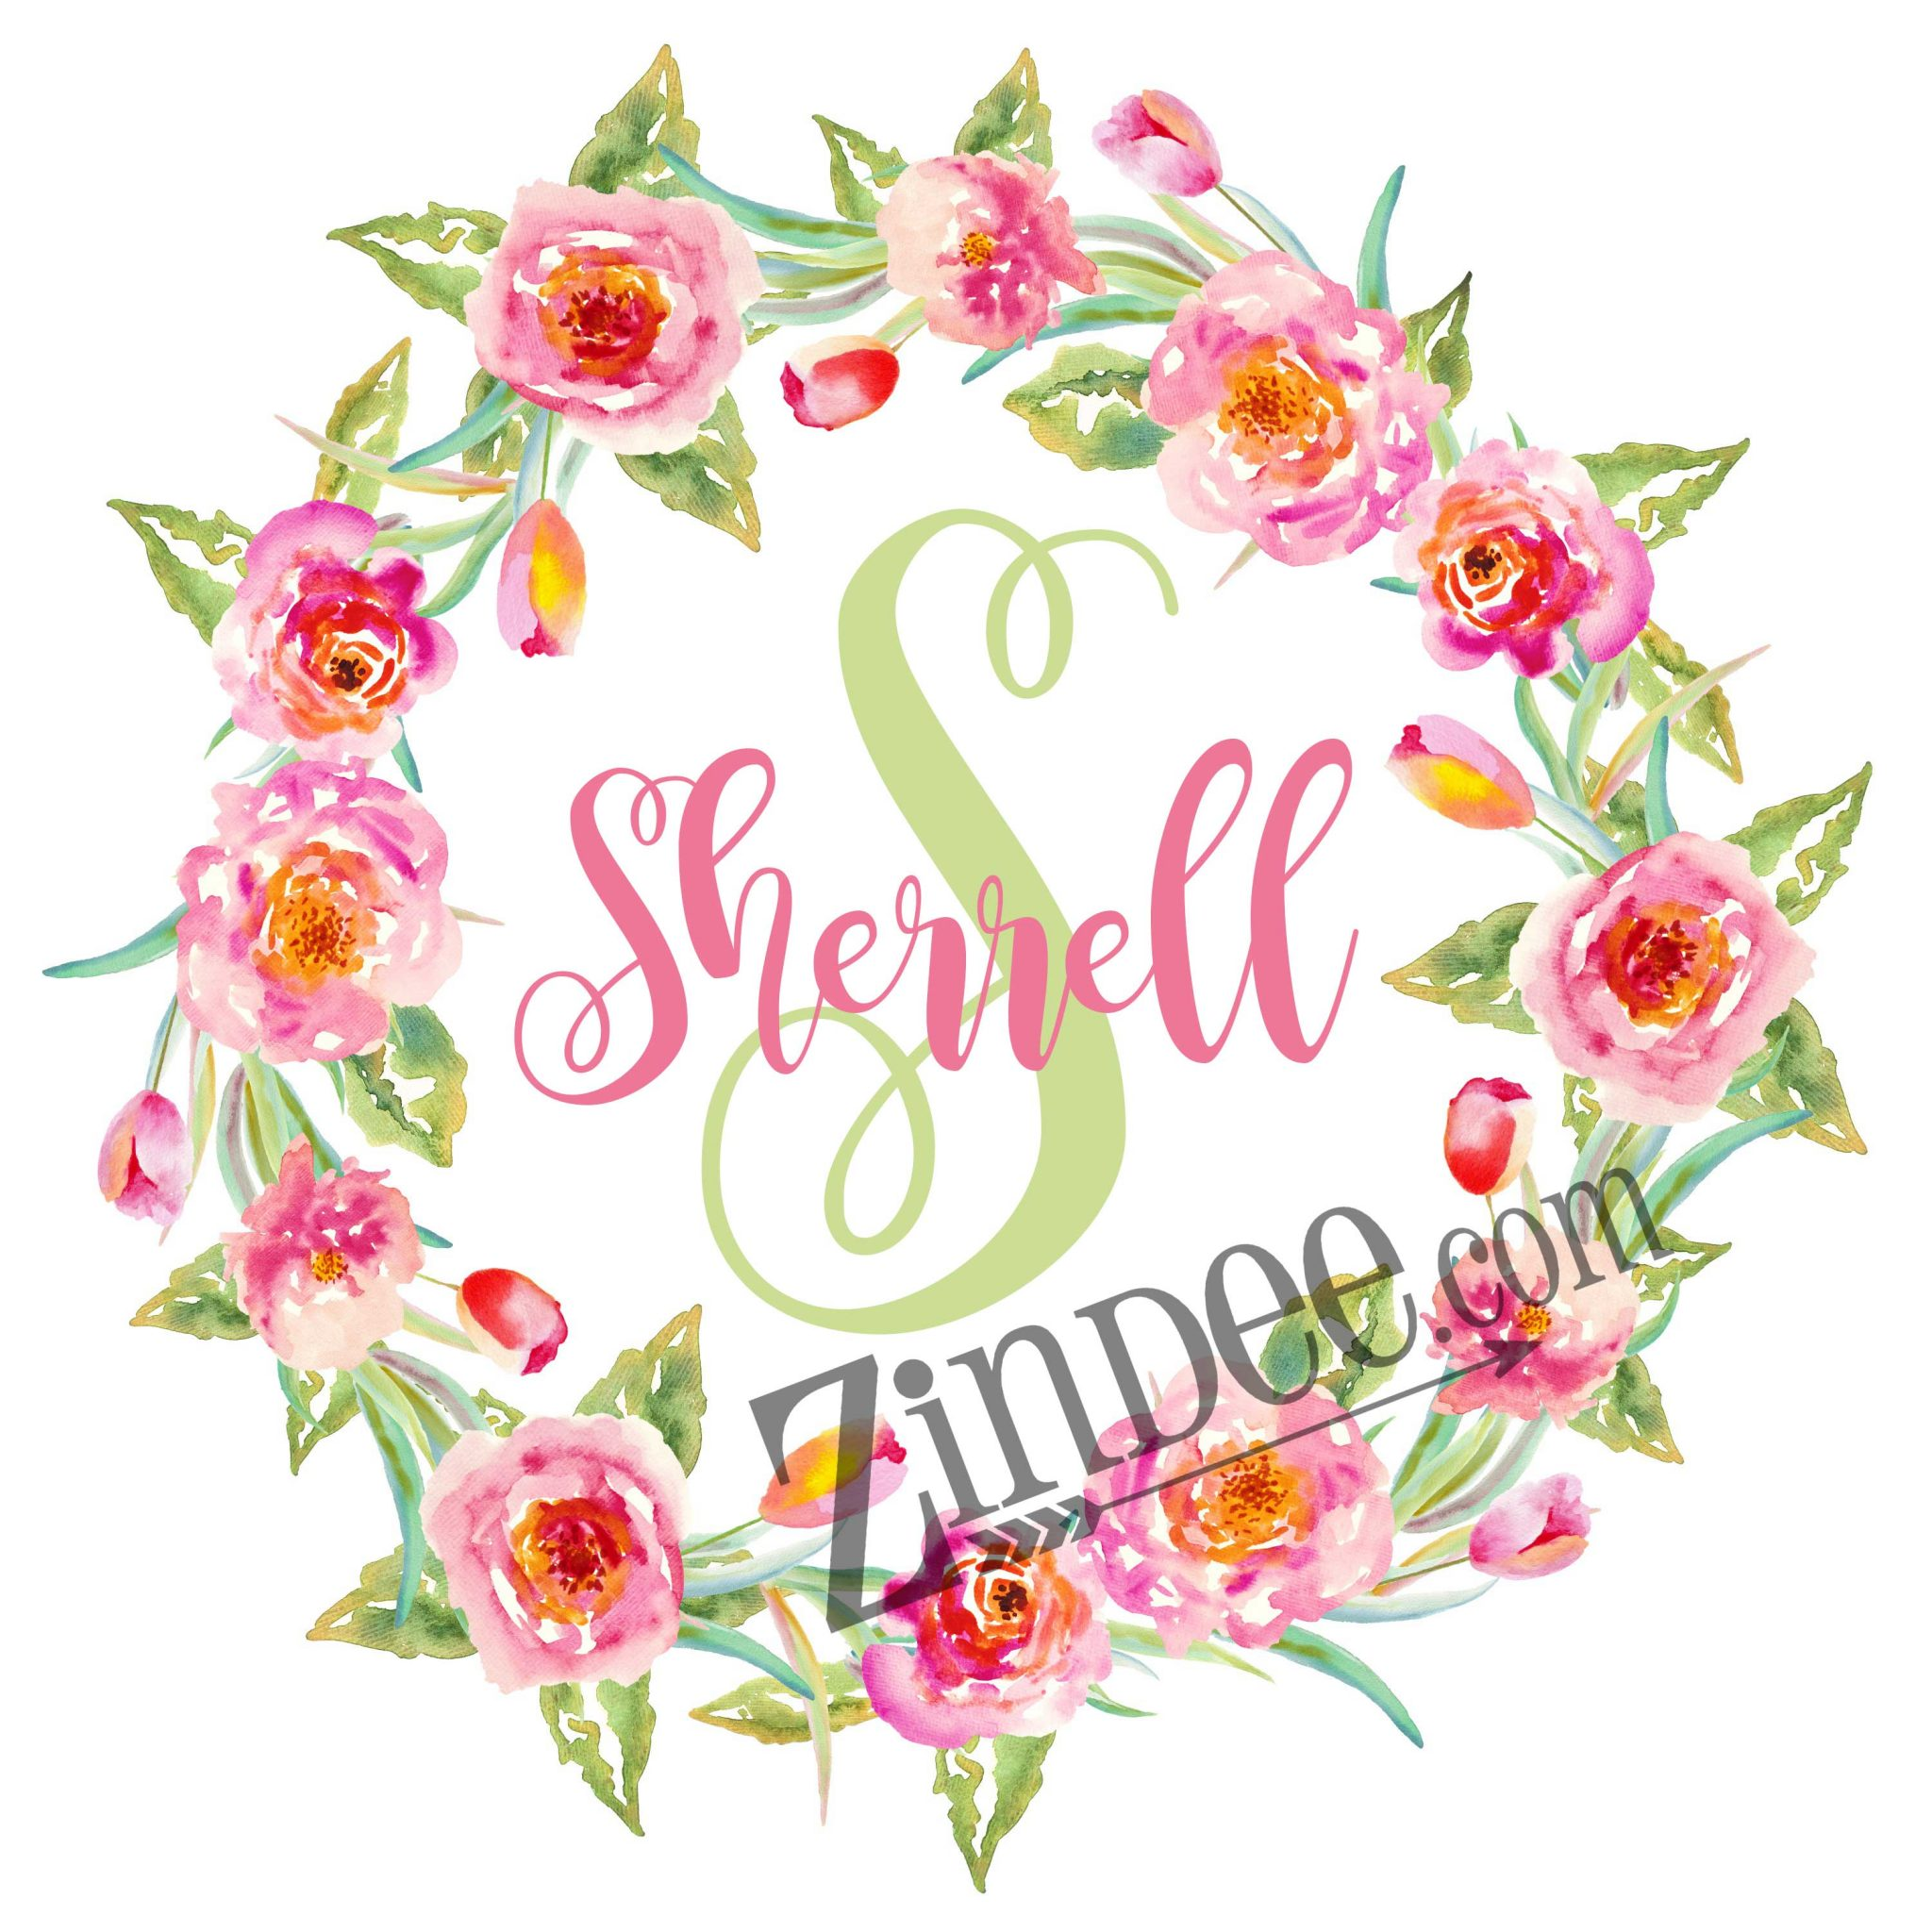 Floral Wreath Sublimation Zindee Studios